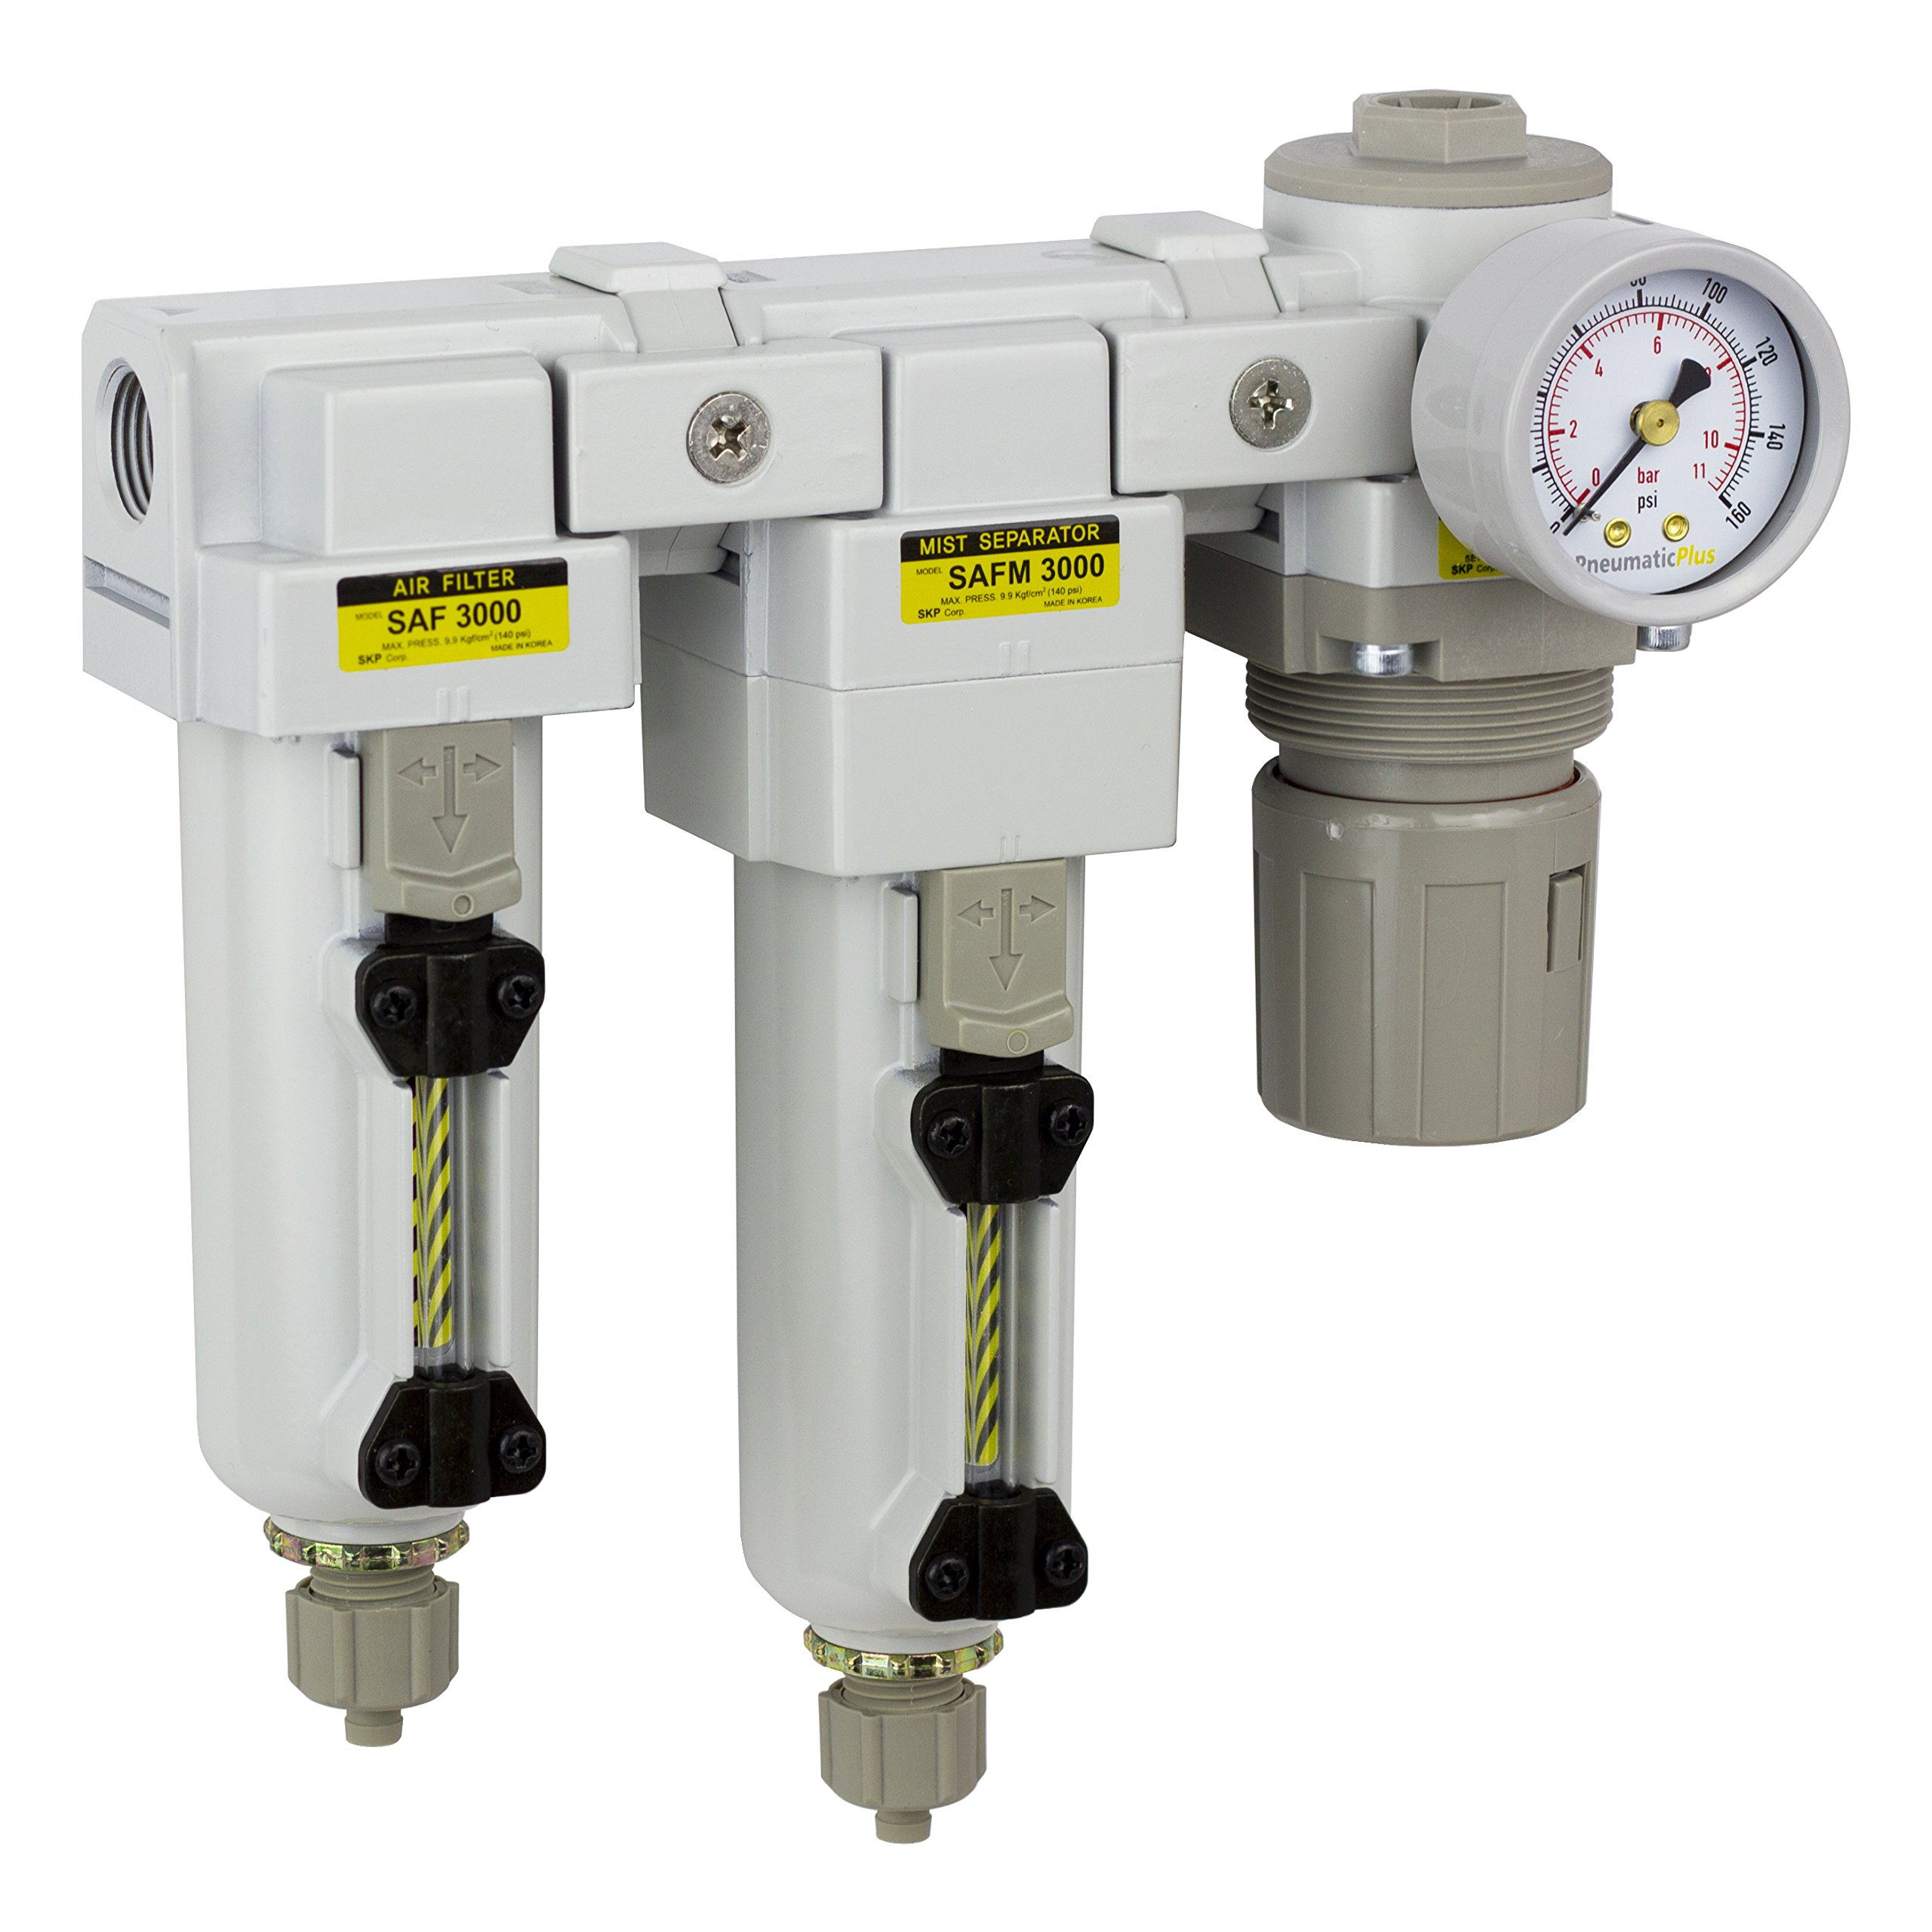 PneumaticPlus SAU3030M-N03G-MEP Three Stage Air Drying System - Air Particulate Filter, 0.3 Micron Coalescing Filter & Air Pressure Regulator Modular Combo 3/8'' NPT - Manual Drain, Metal Bowl